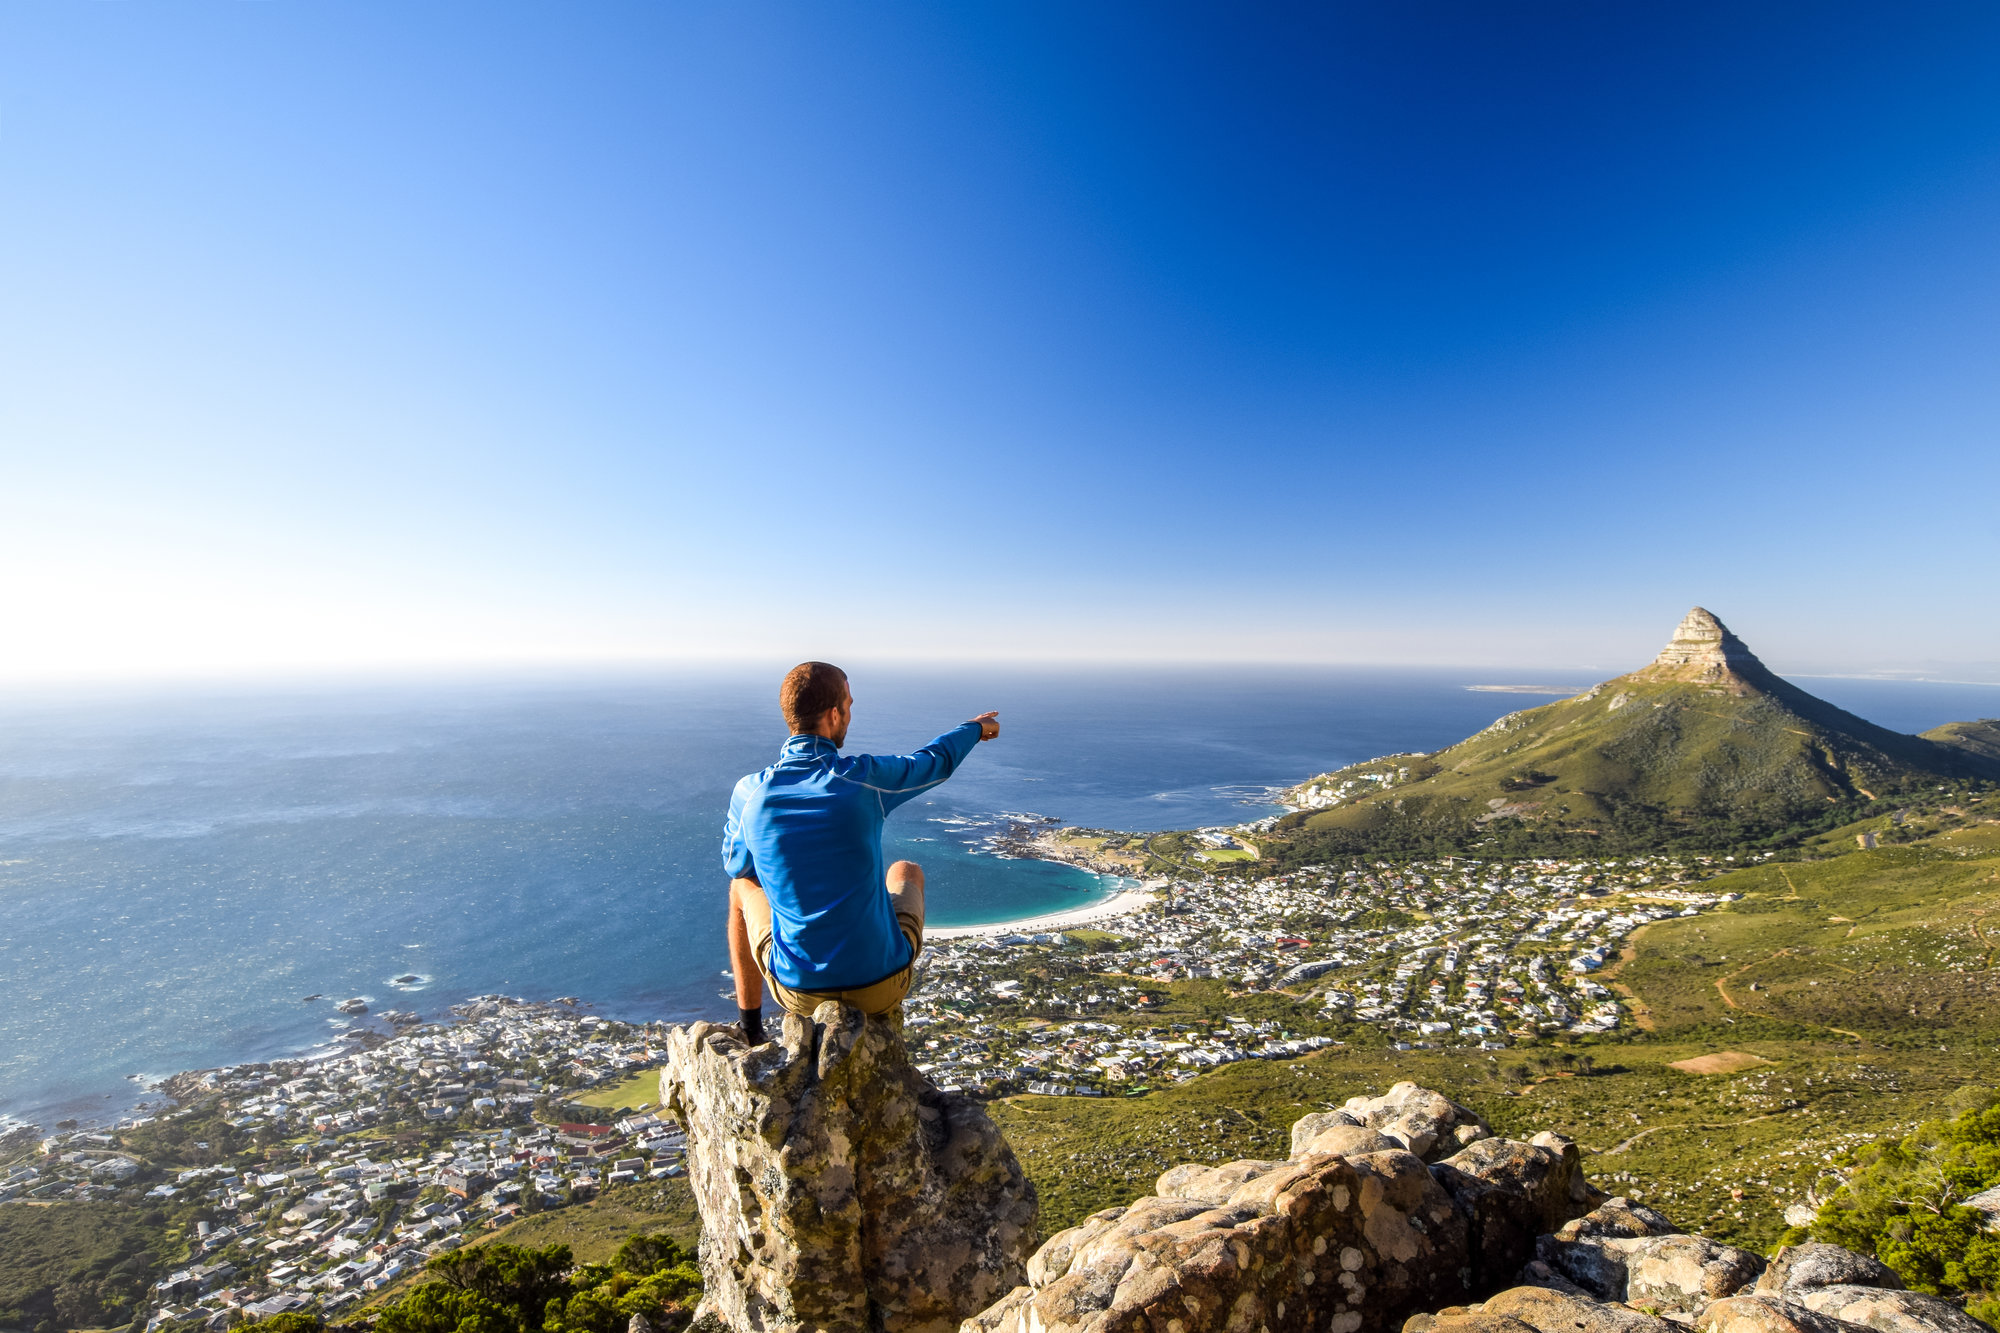 Escape + Explore: Cape Peninsula Wet & Wild Adventure